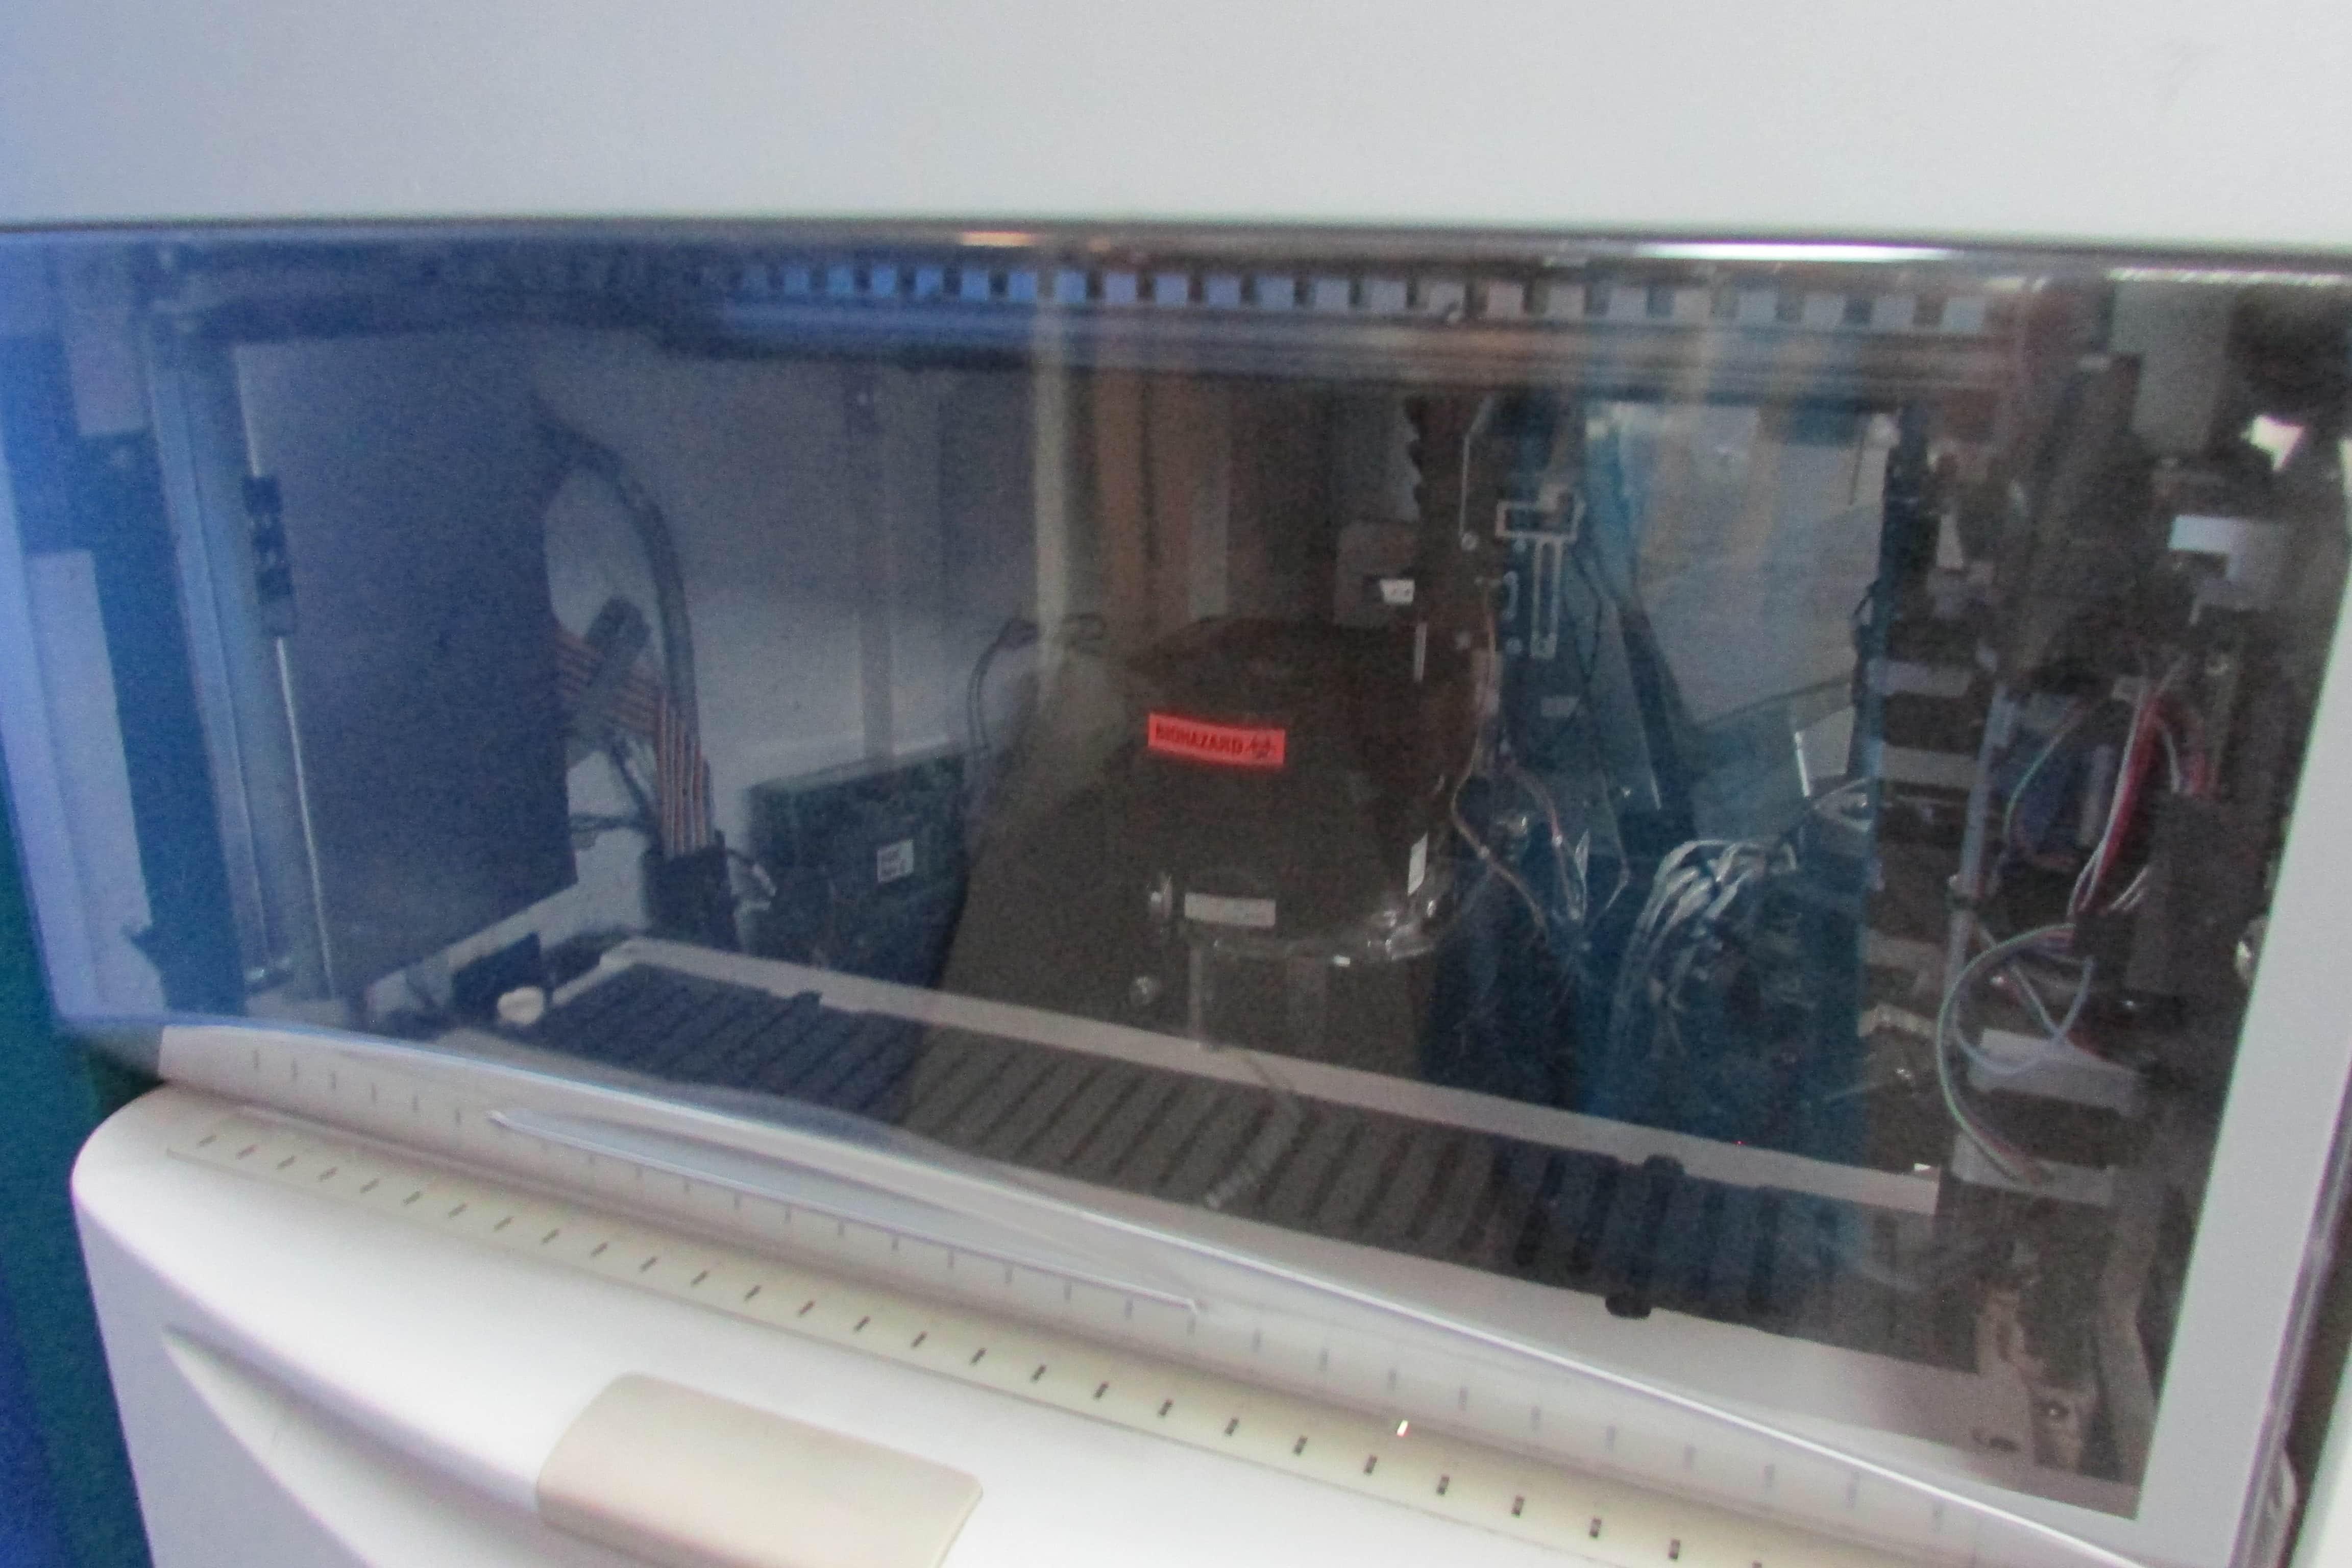 Siemens Advia Centaur XP Immunoassay System In excellent condtion just PM by OEM